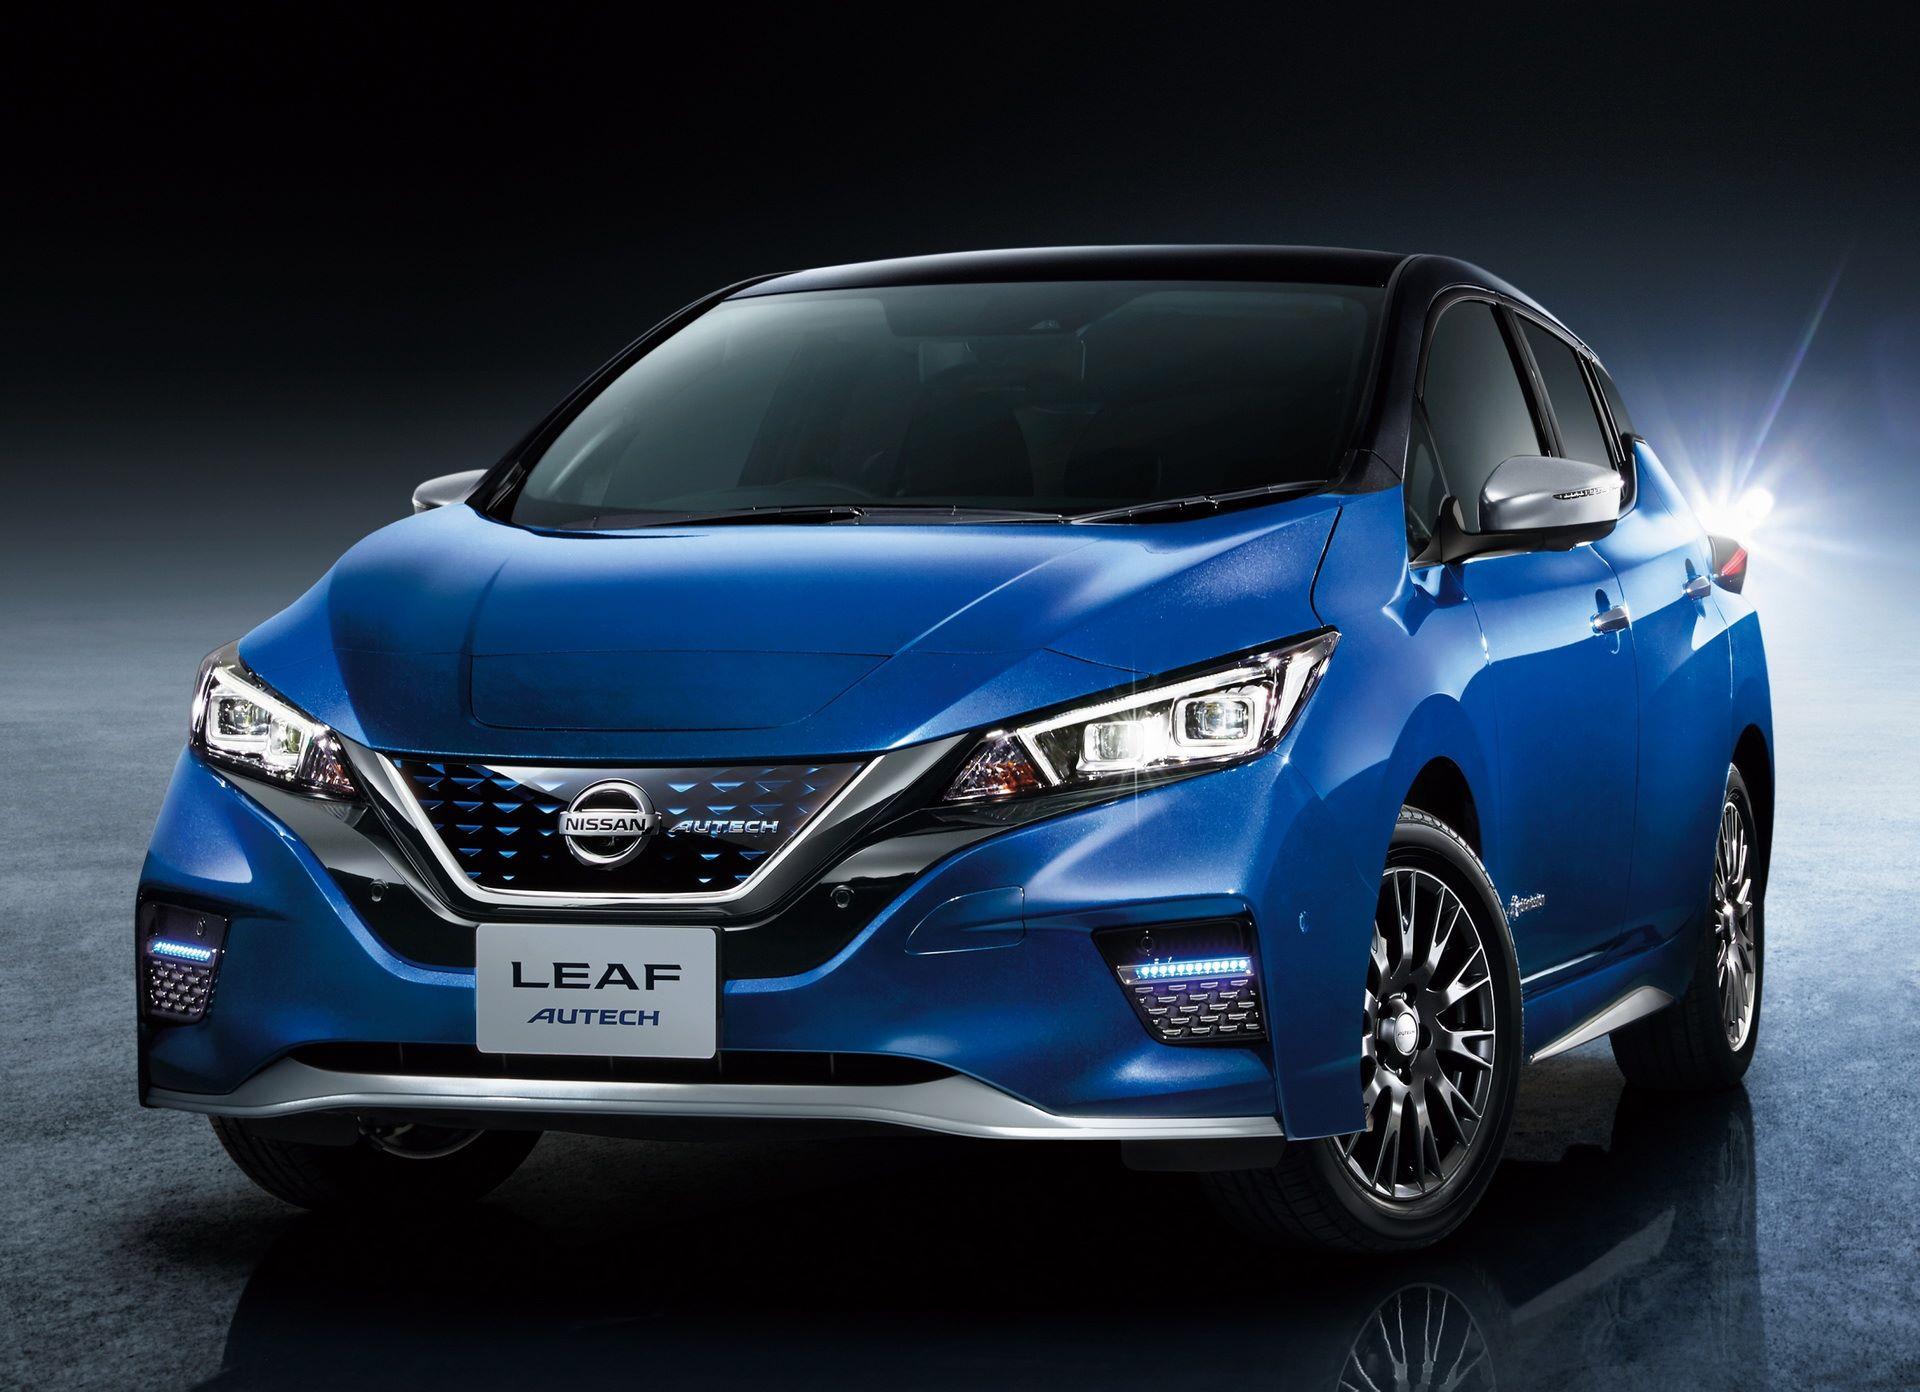 Nissan-leaf-japan-2020-26